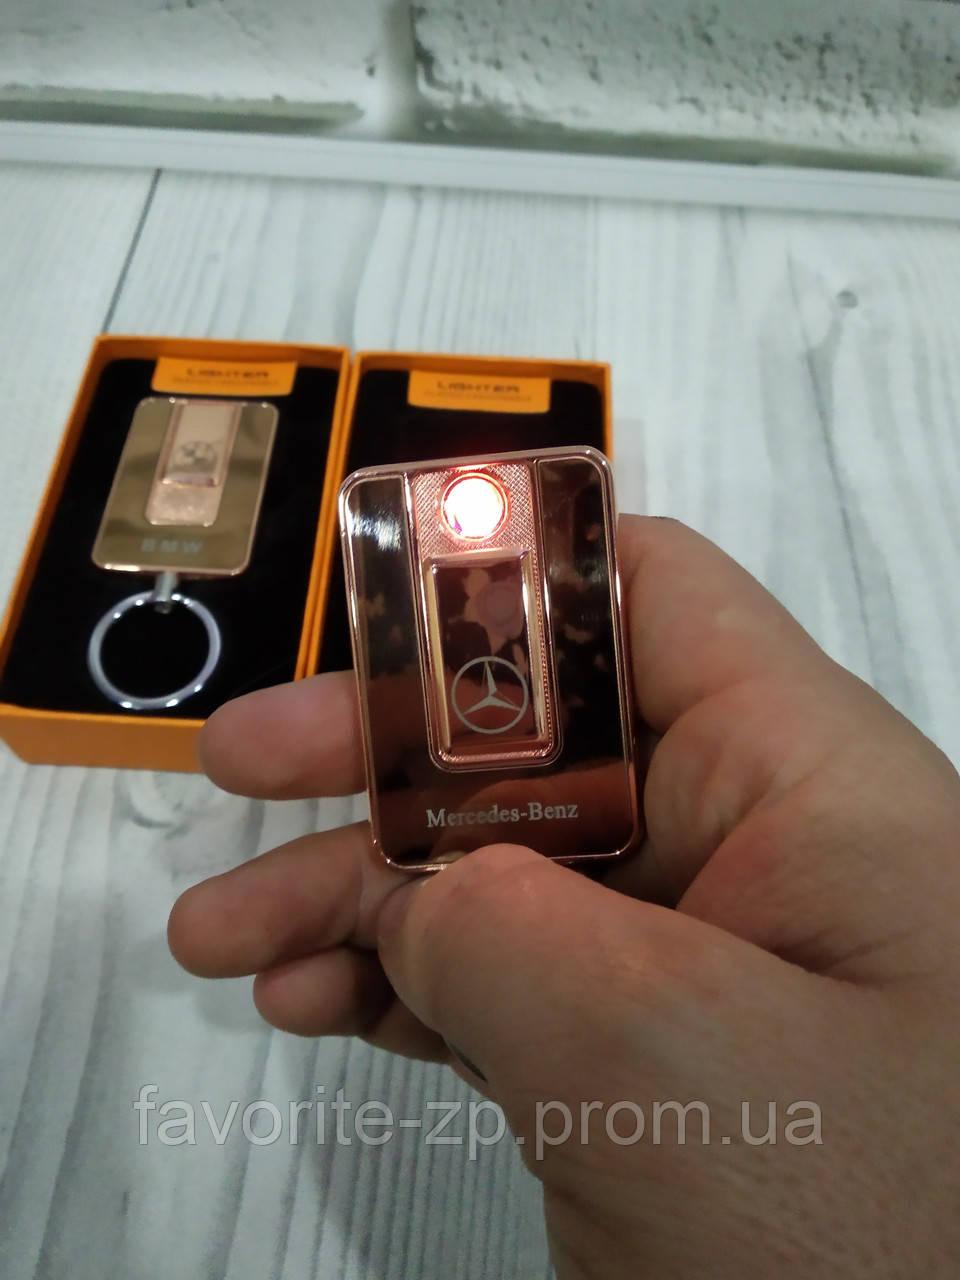 Электроимпульсная зажигалка Lighter 811 спиральная usb зажигалка юсб BMW.Mercedes Золотая